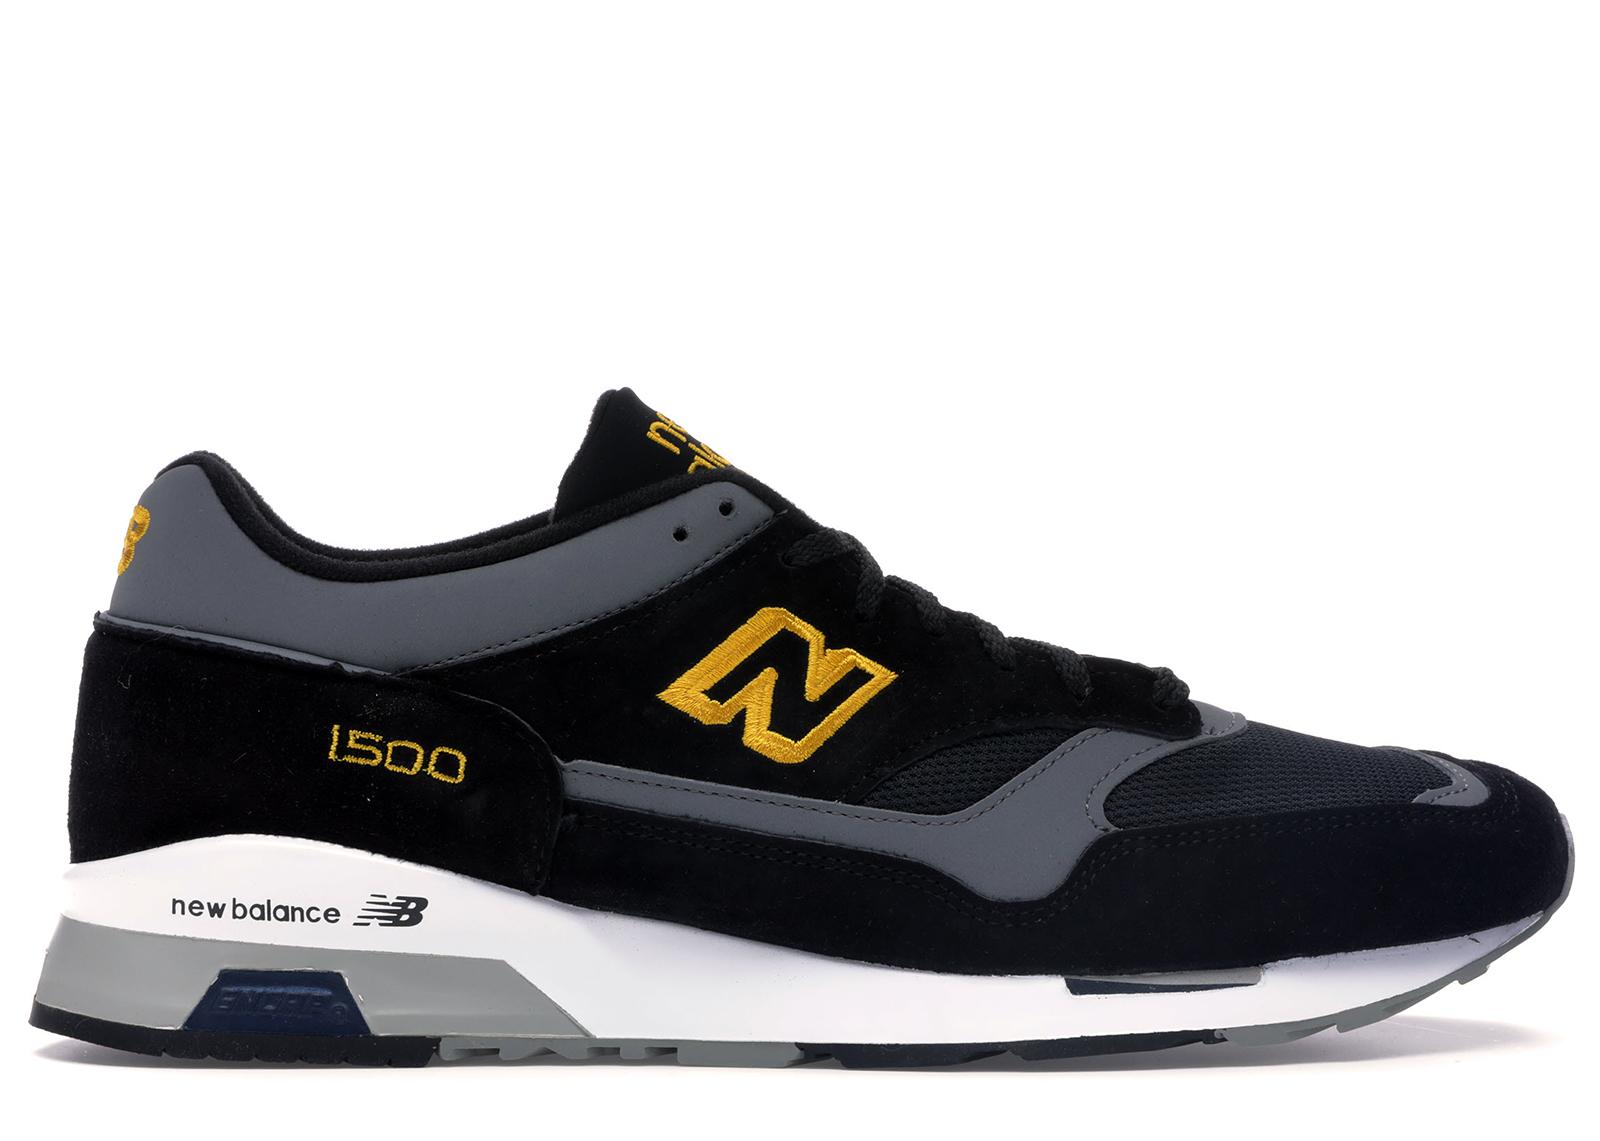 New Balance 1500 Black Yellow